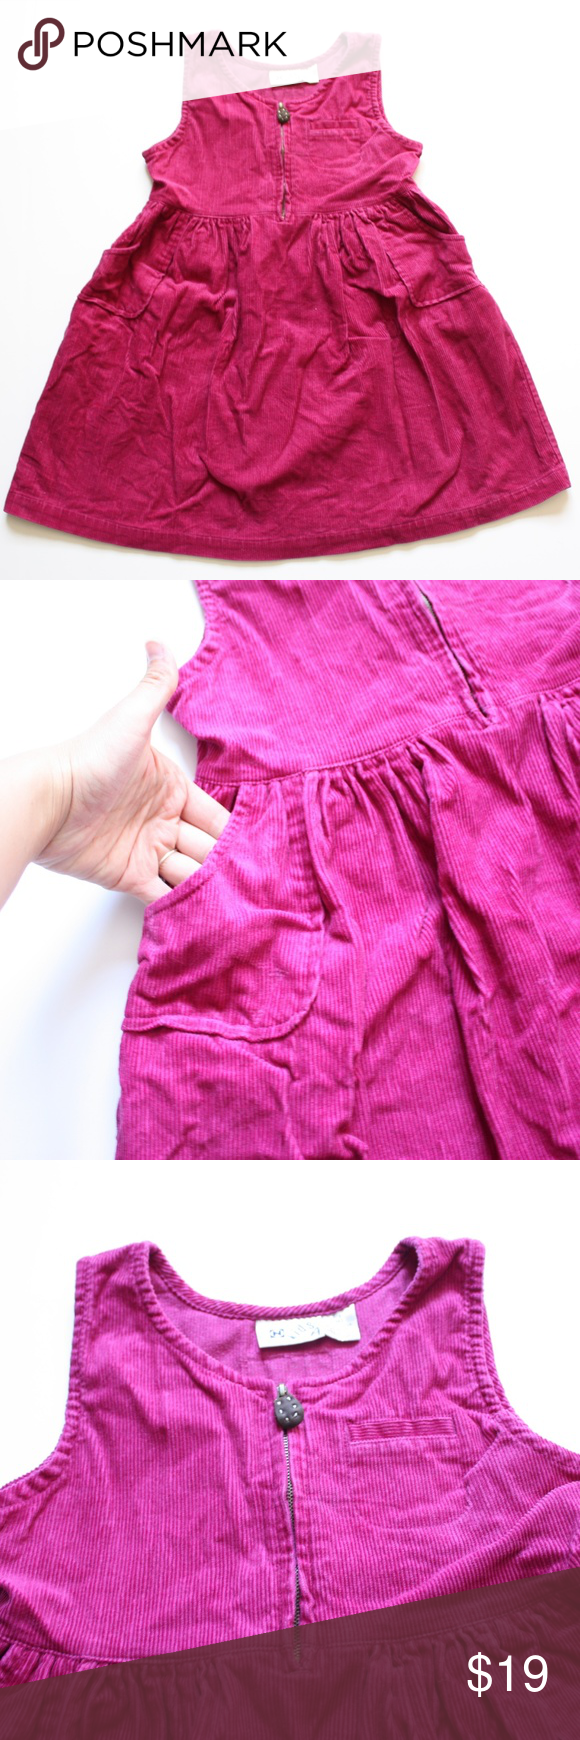 Pink n purple dress  Vintage Corduroy Magenta Dress Sz   My Posh Picks  Pinterest